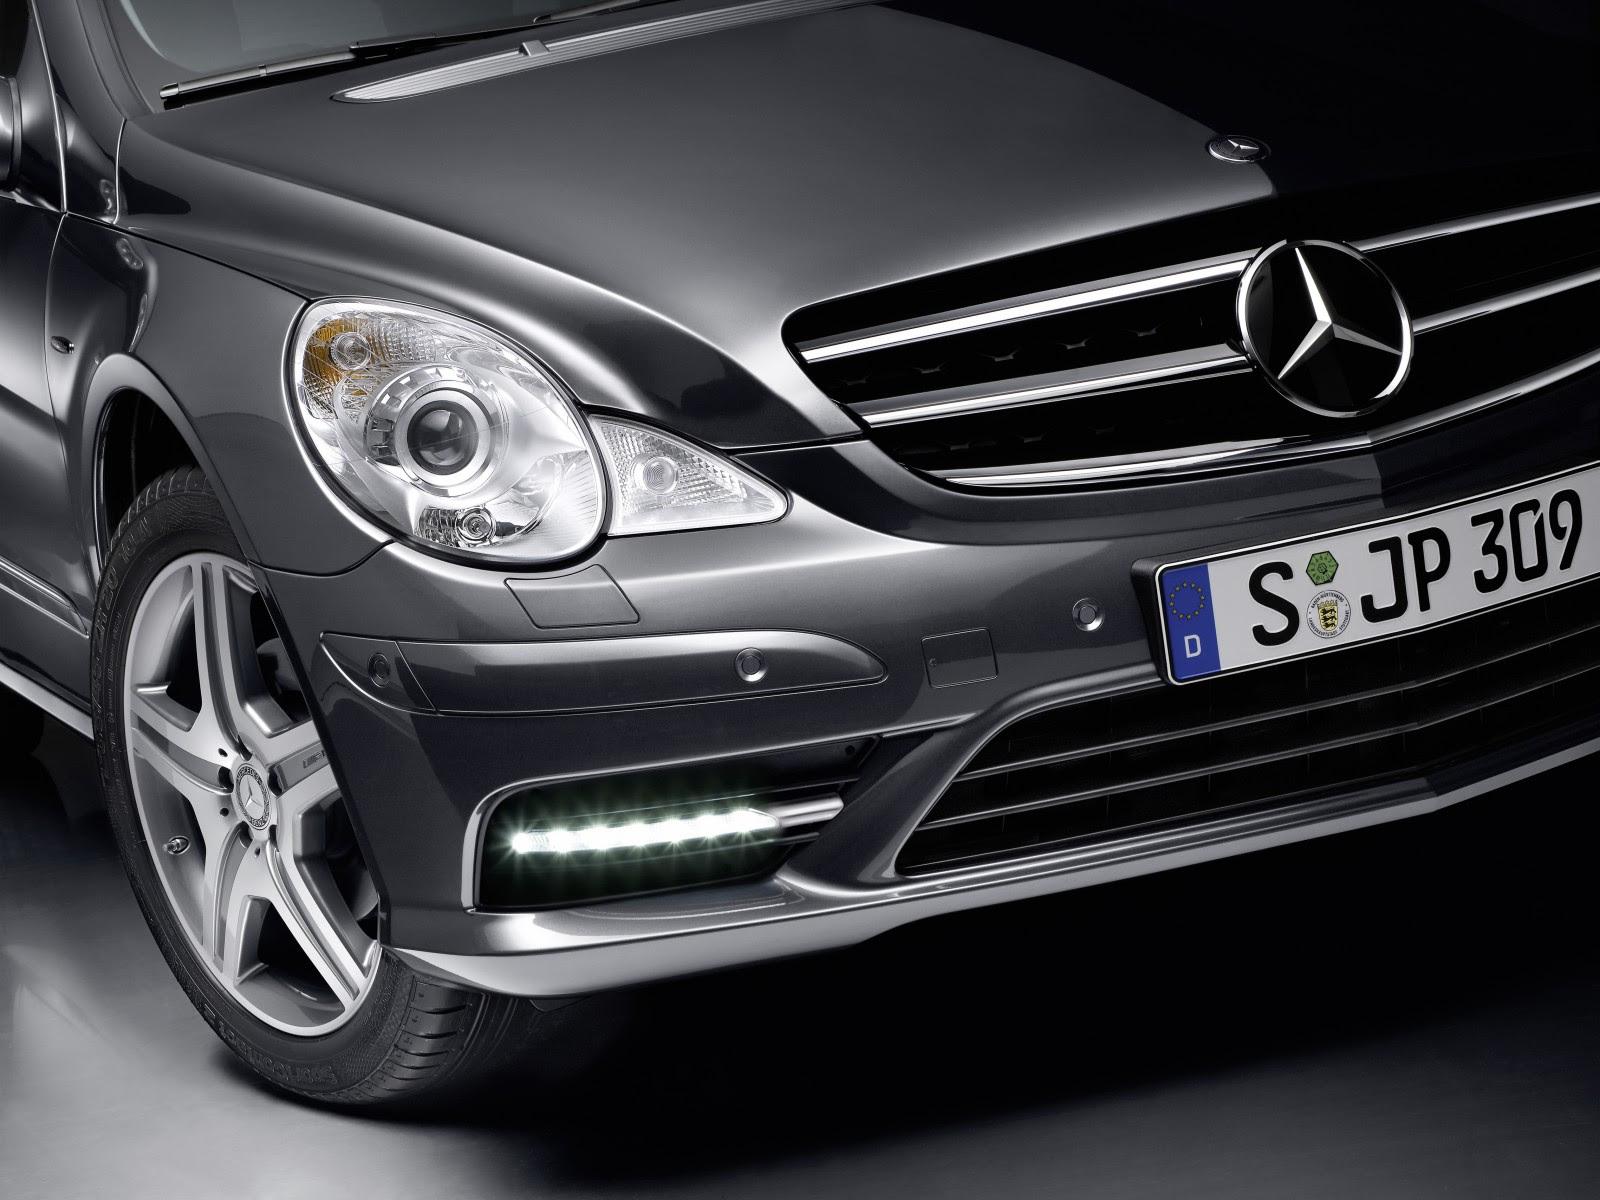 2009 Mercedes-Benz R 350 CDI | Motor Desktop